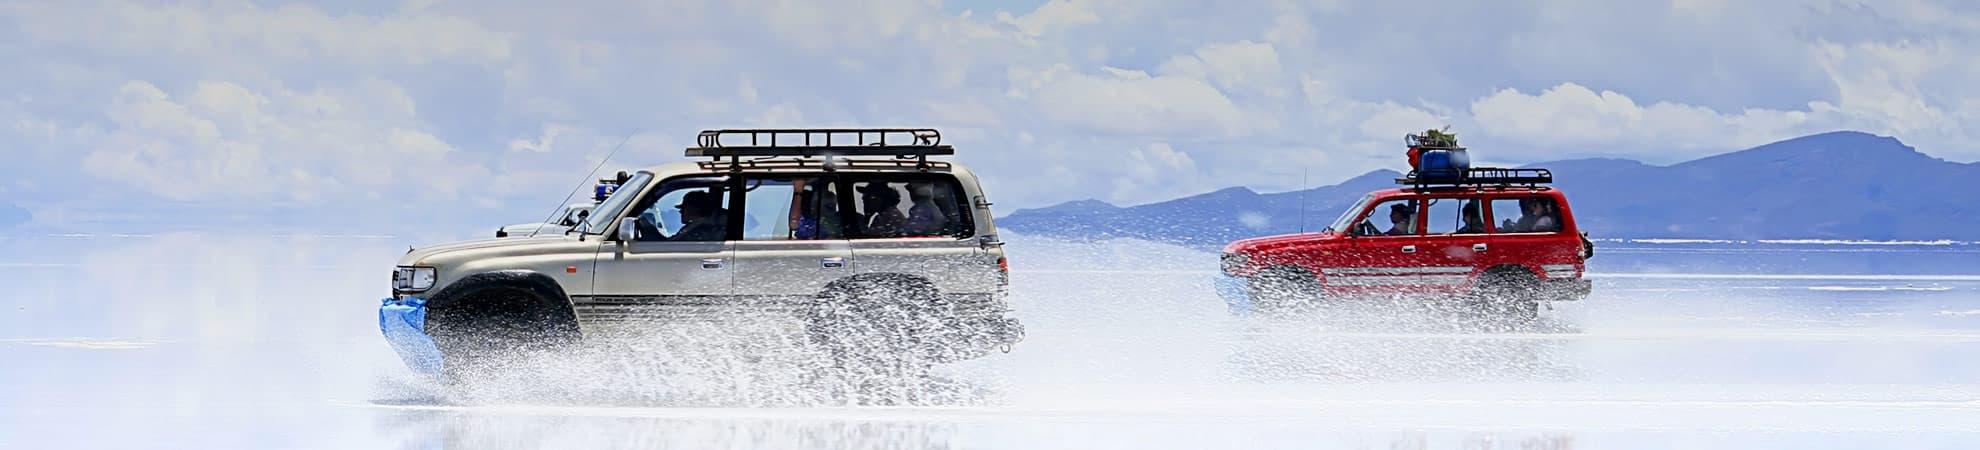 Voyage L'Altiplano en Bolivie